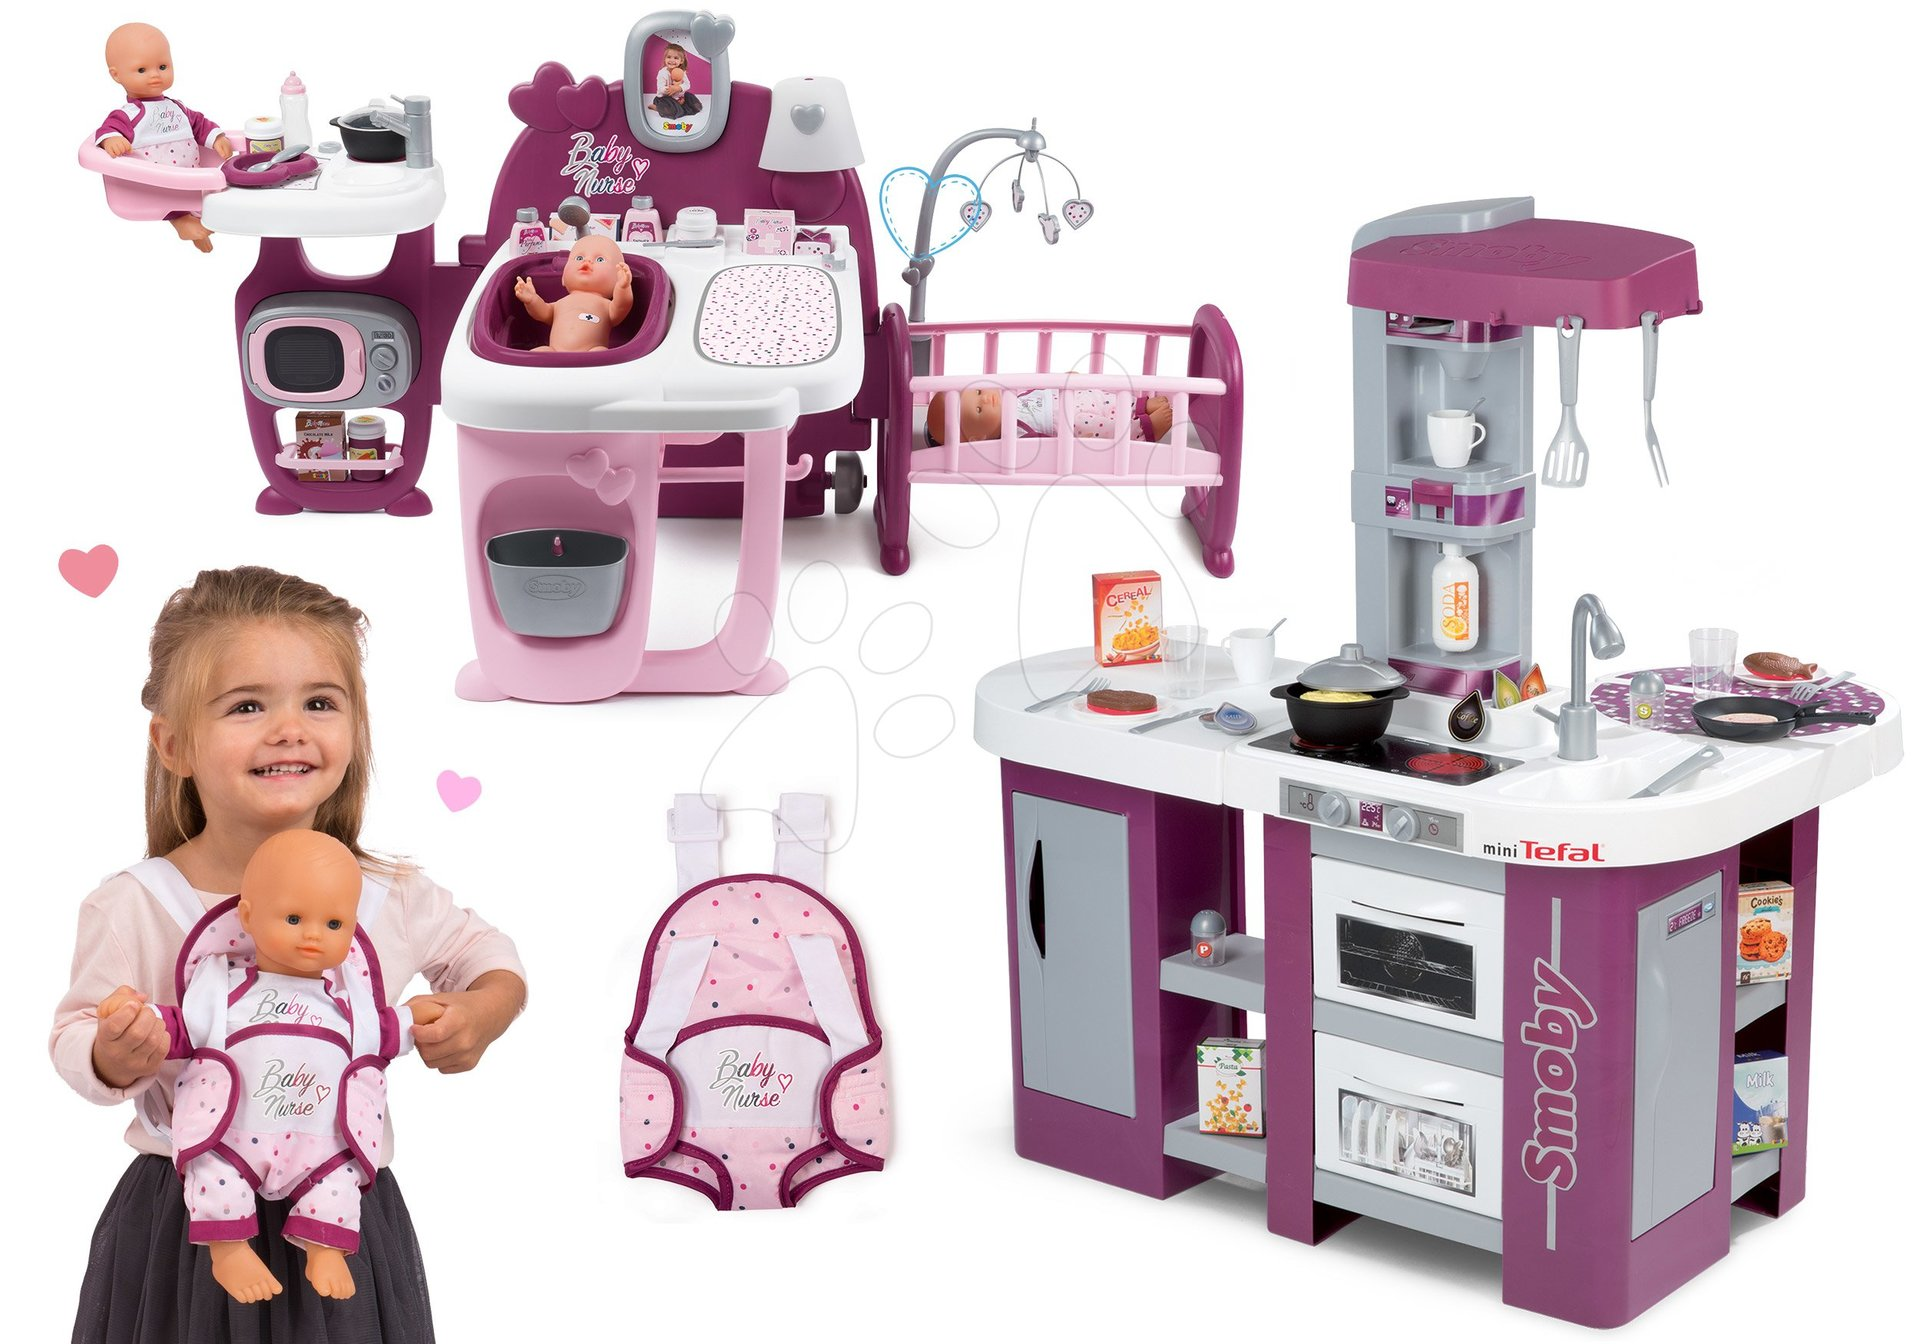 Set kuchynka fialová Tefal Studio XL Smoby elektronická s umývačkou riadu a domček pre bábiku s nosítkom Violette Baby Nurse Large Doll's Play Center